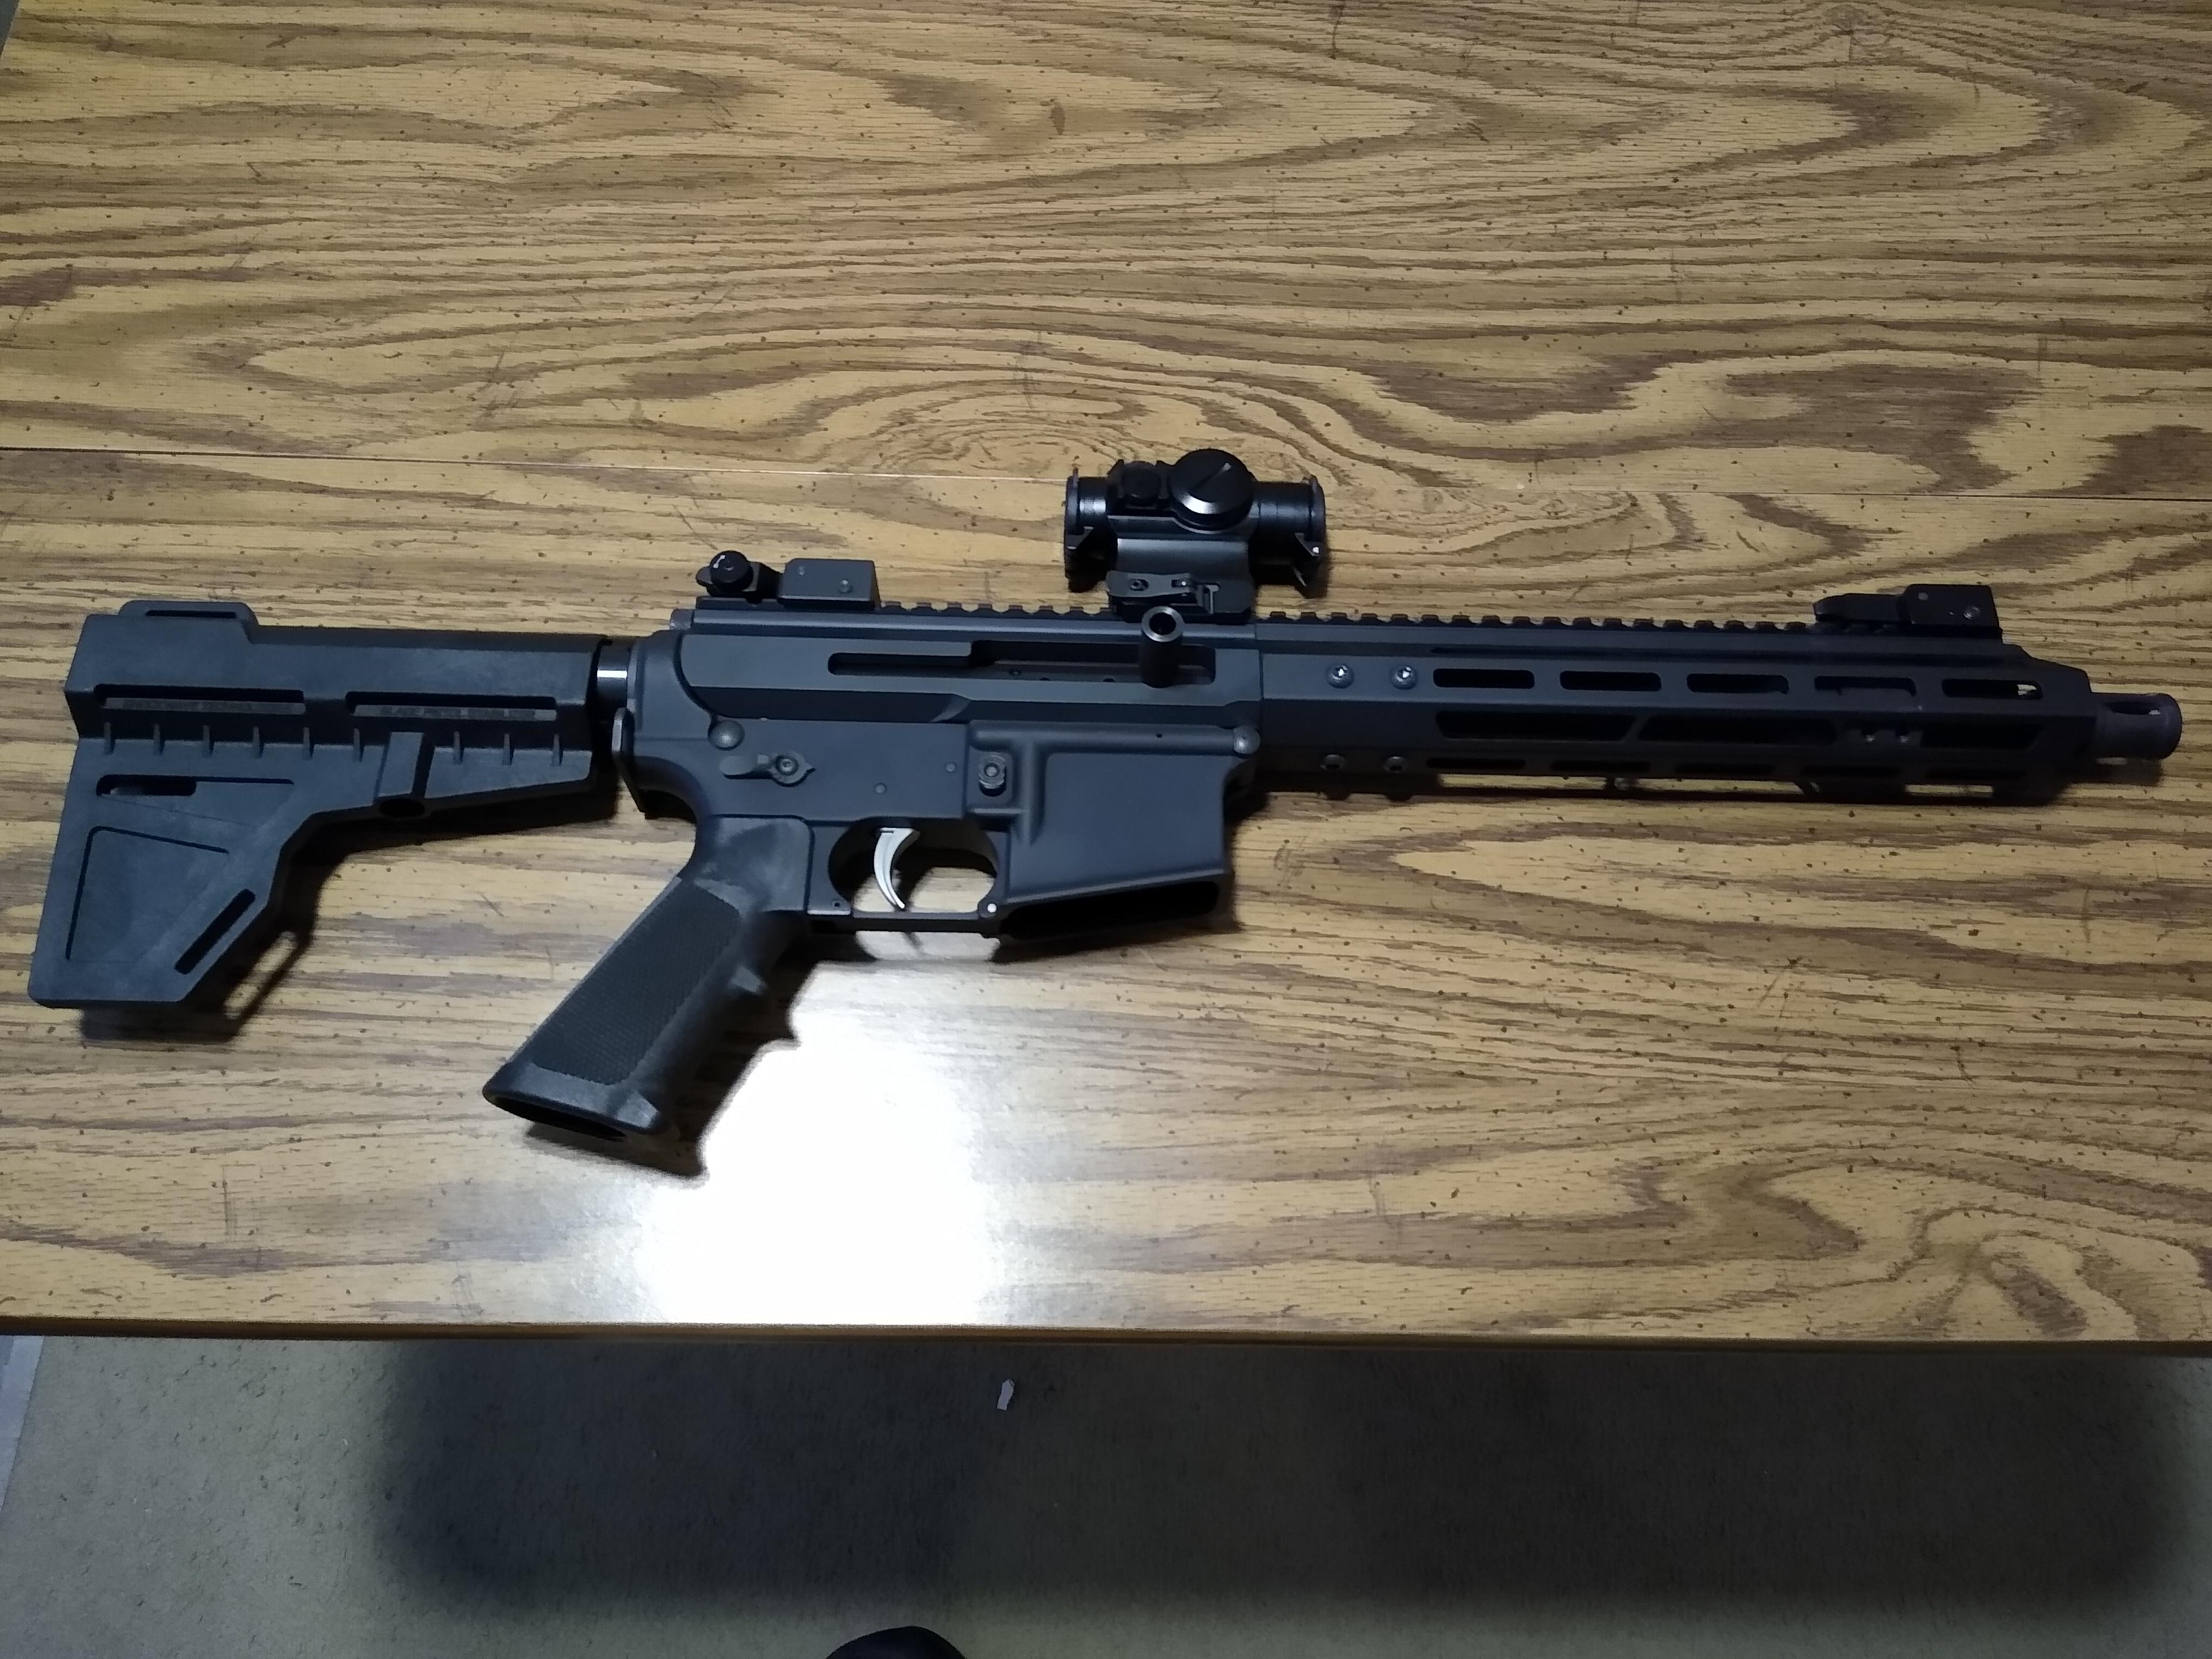 First AR pistol build-img_20200405_183214224_1586194962281.jpg